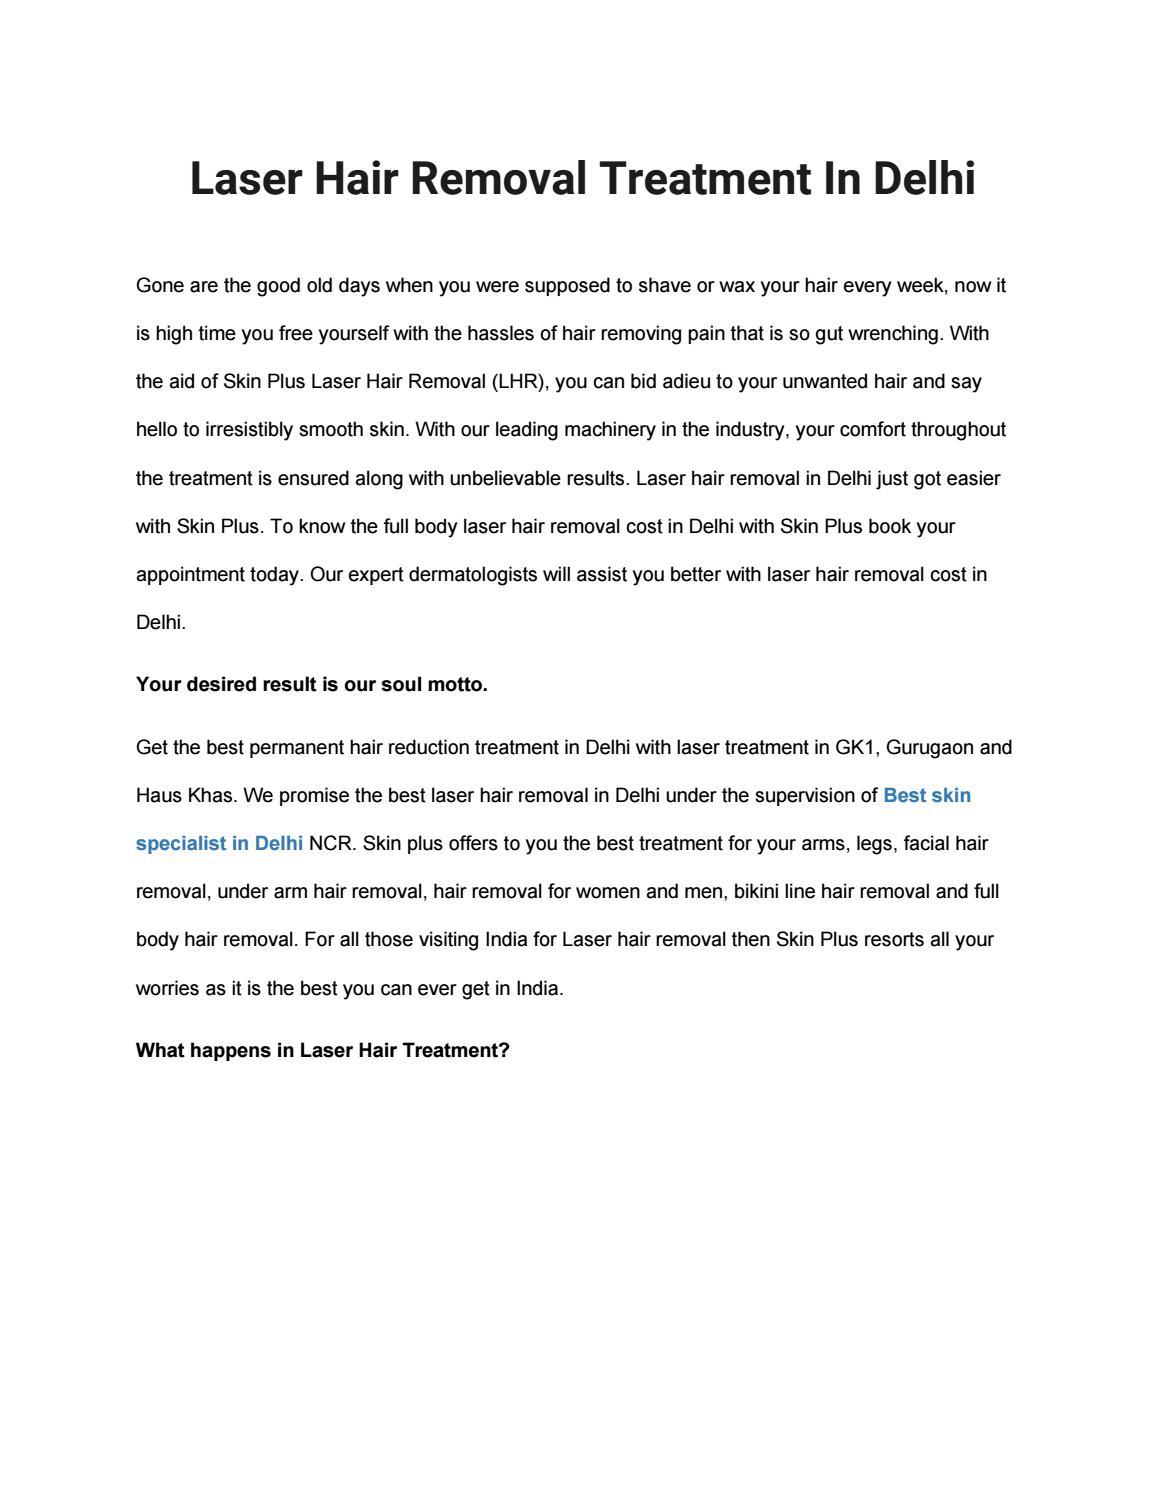 Laser Hair Removal Treatment In Delhi By Vedika Sharma1109 Issuu